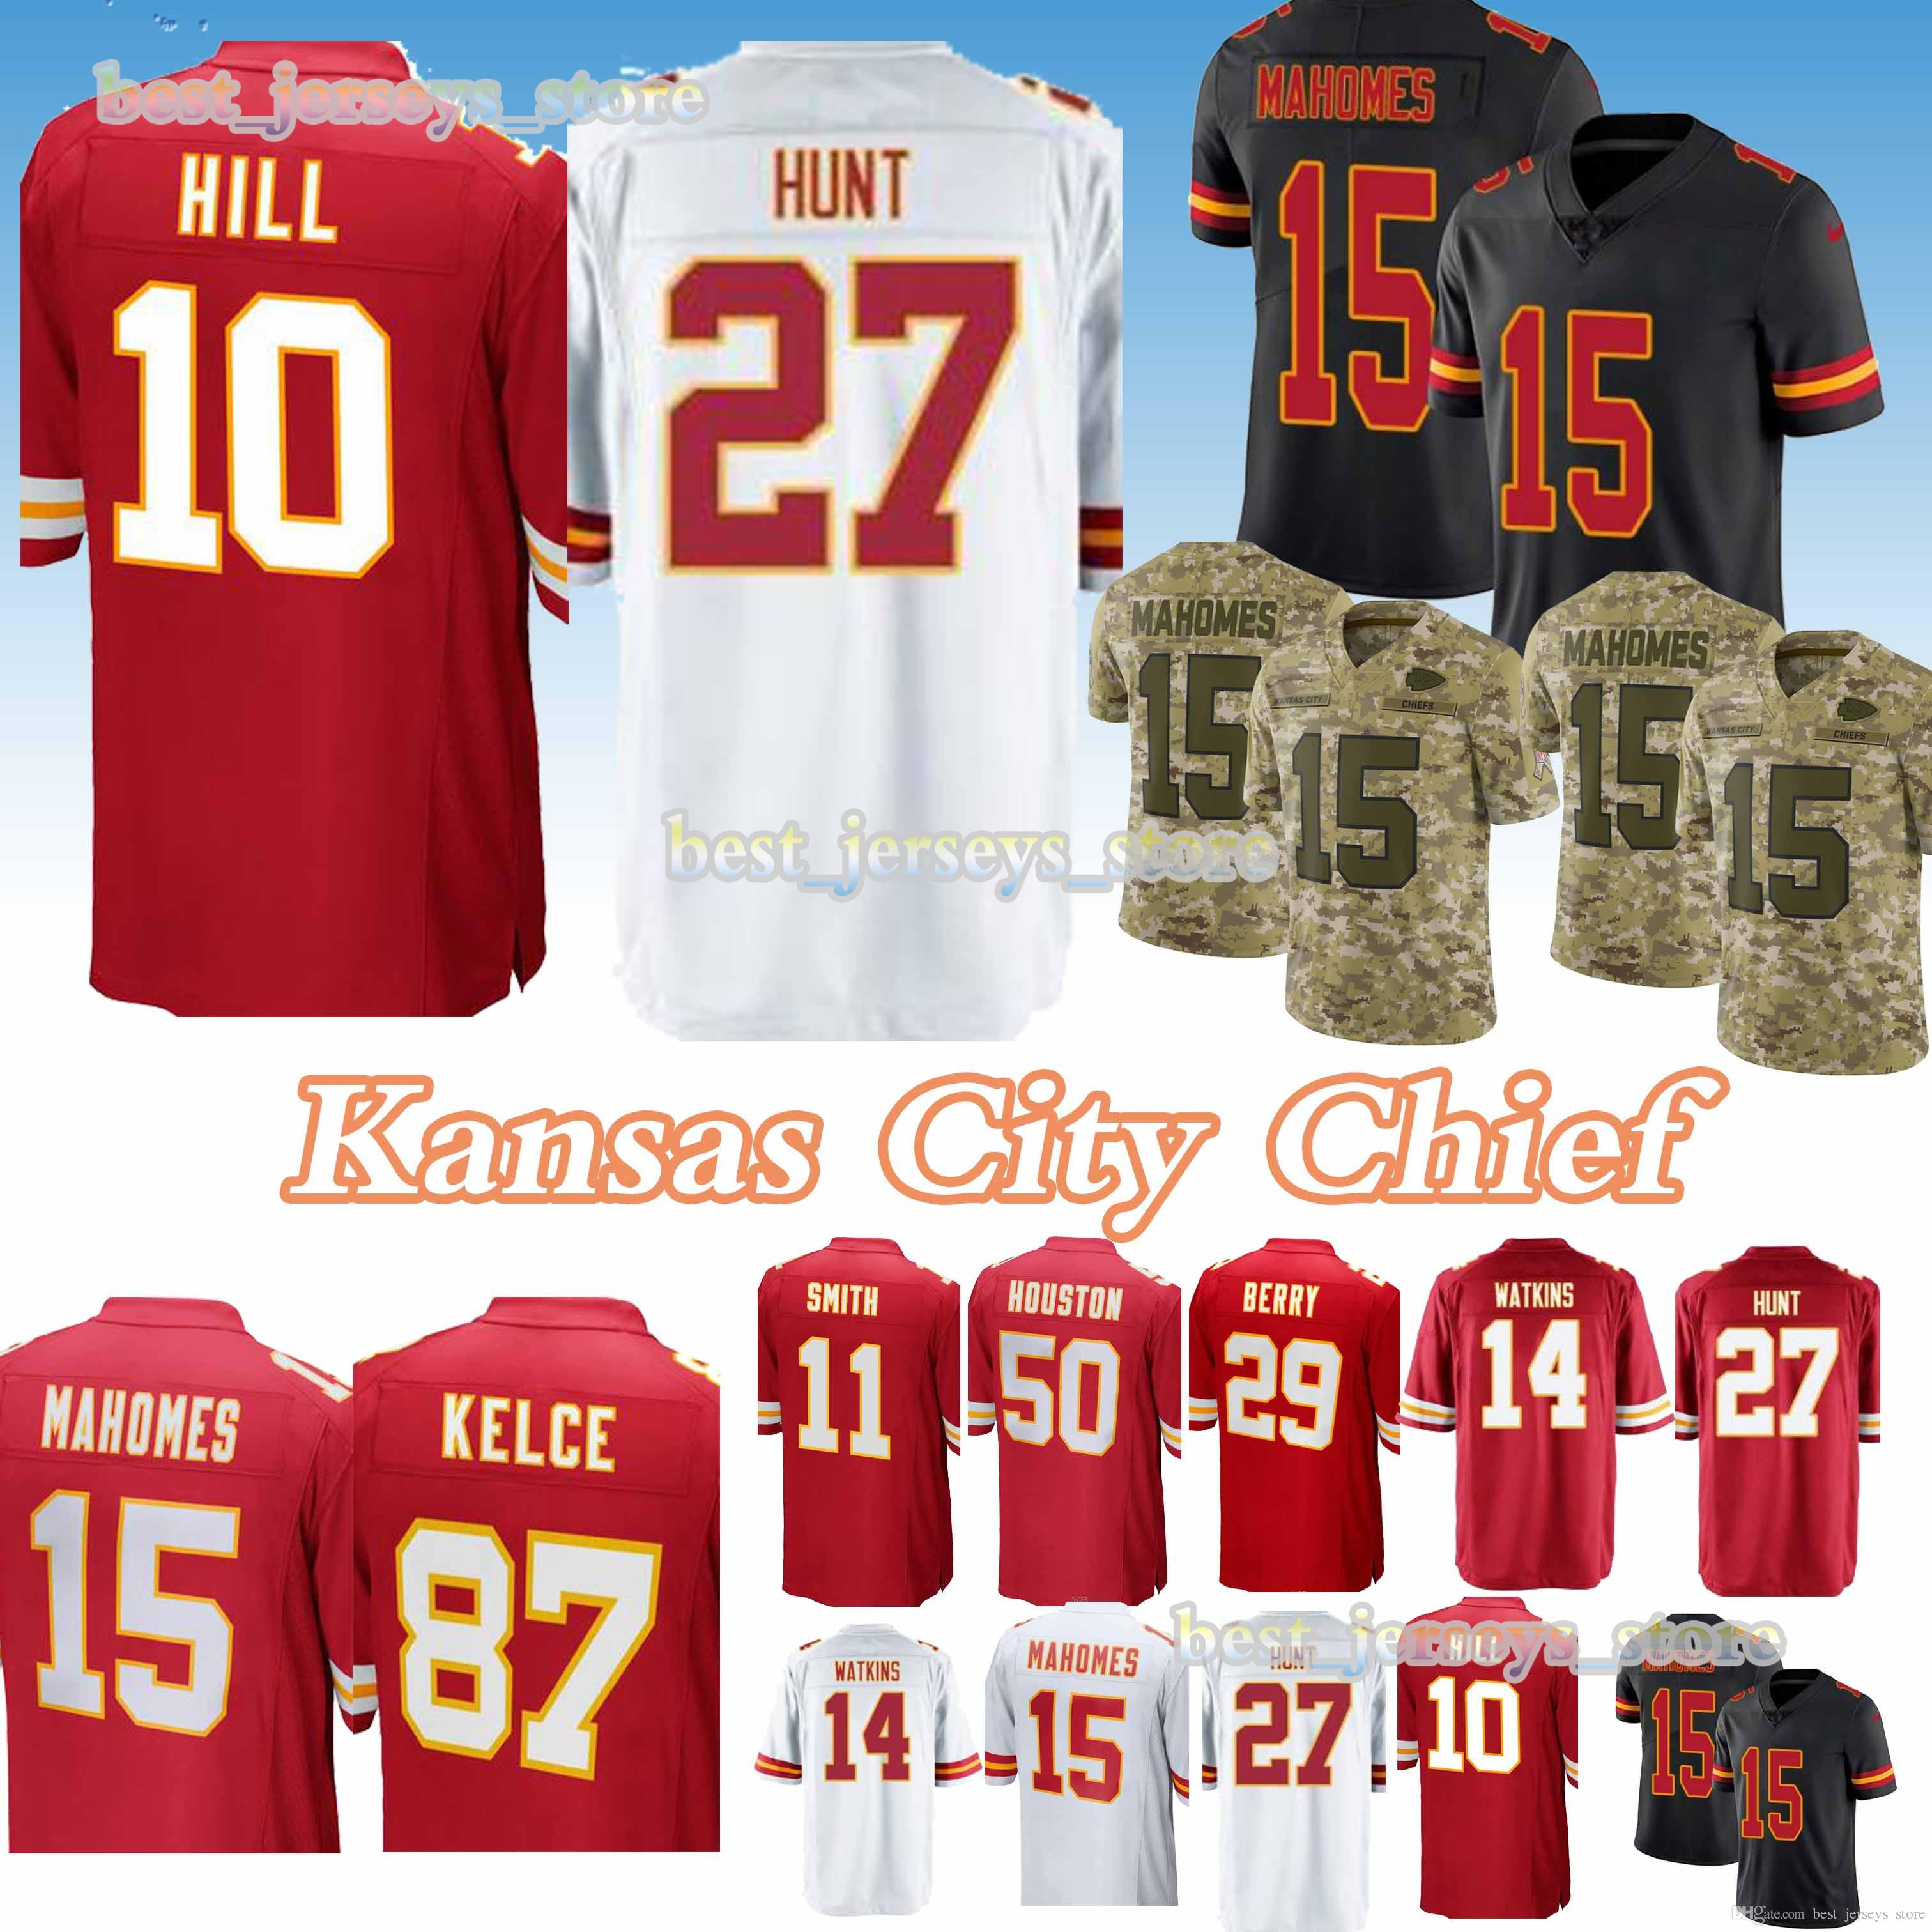 a44b5bc6eda 2019 50 Justin Houston 10 Tyreek Hill 87 Travis Kelce Kansas City Jerseys  Chief 15 Patrick Mahomes 14 Sammy Watkins New Jersey 2019 Design Sweat From  ...